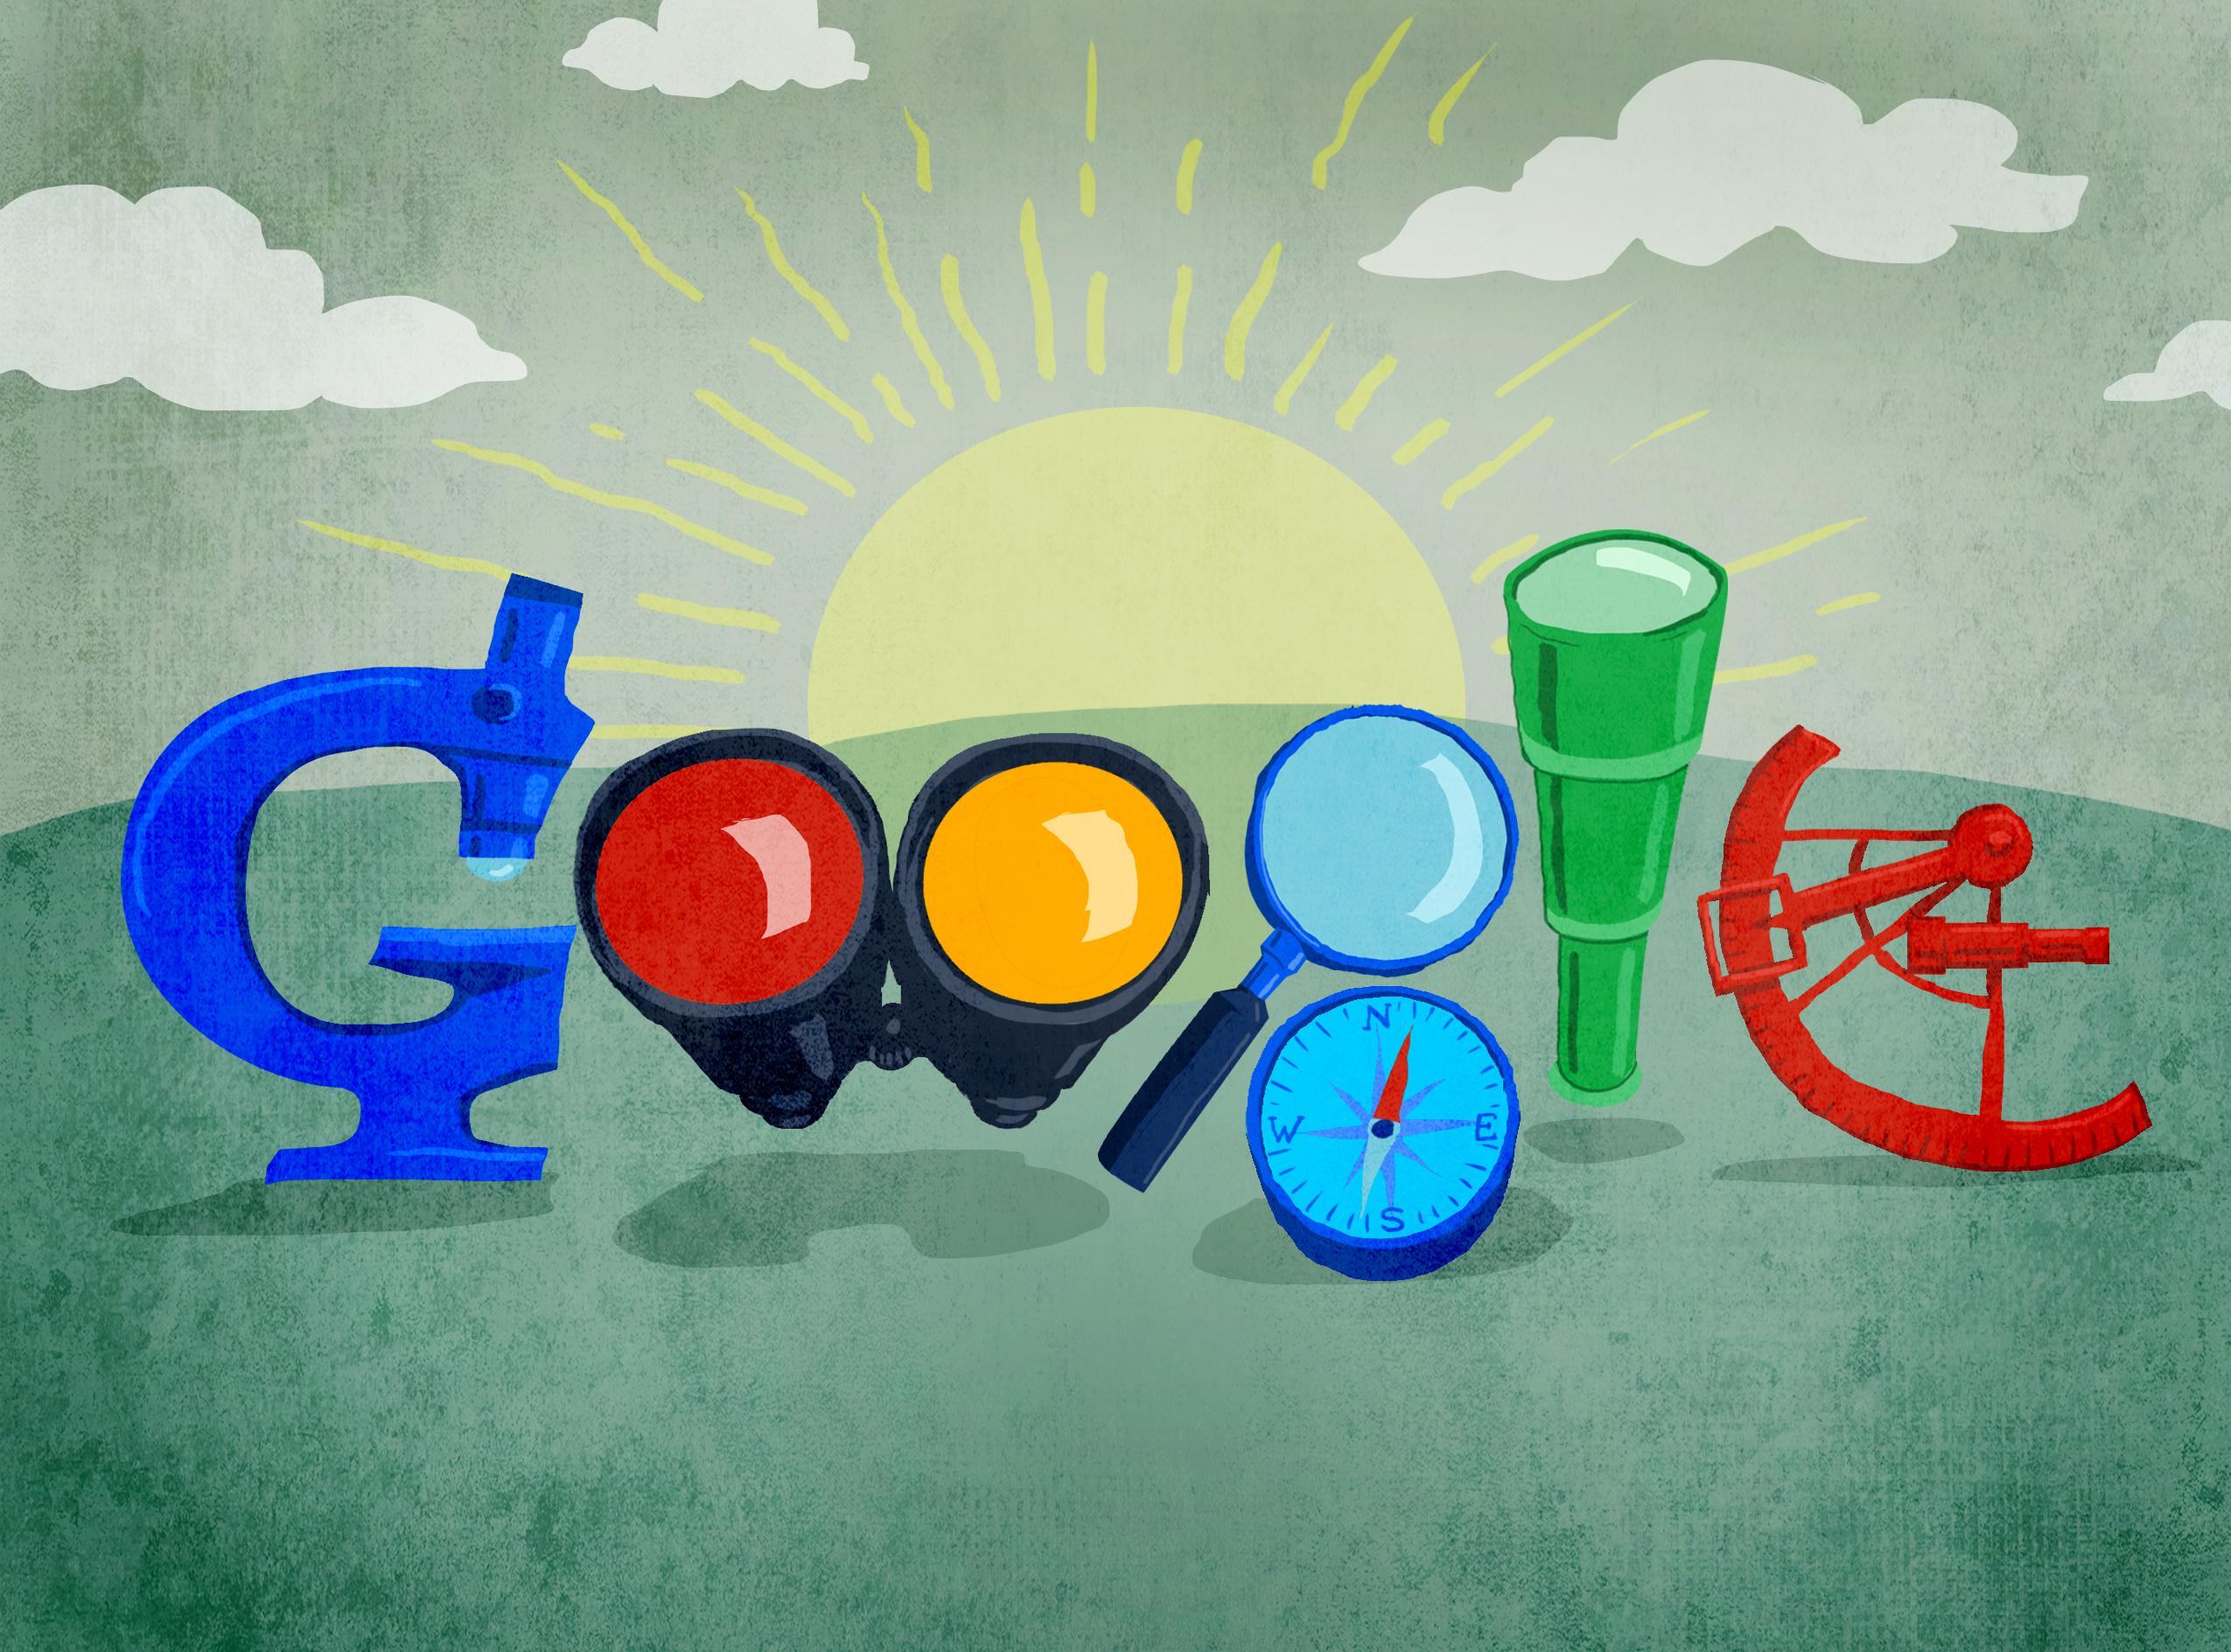 web-autocompletar-google